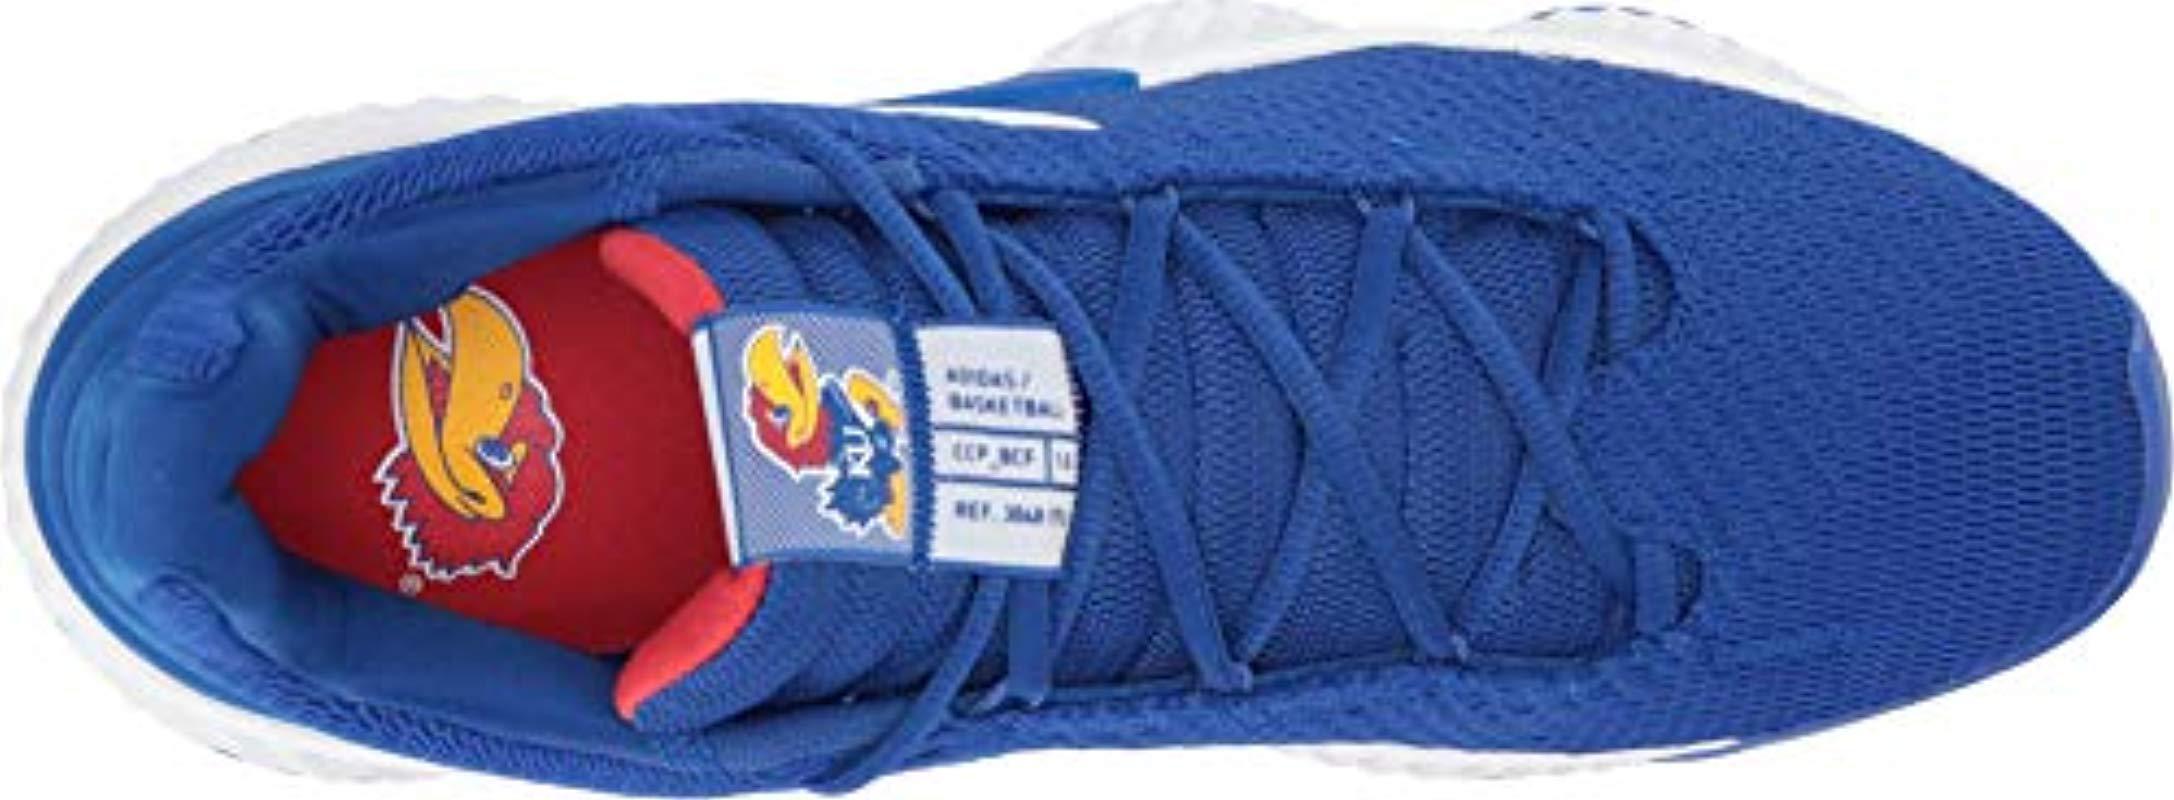 f3fe5c07b38fa Adidas Originals - Blue Pro Bounce 2018 Low Basketball Shoe for Men - Lyst.  View fullscreen